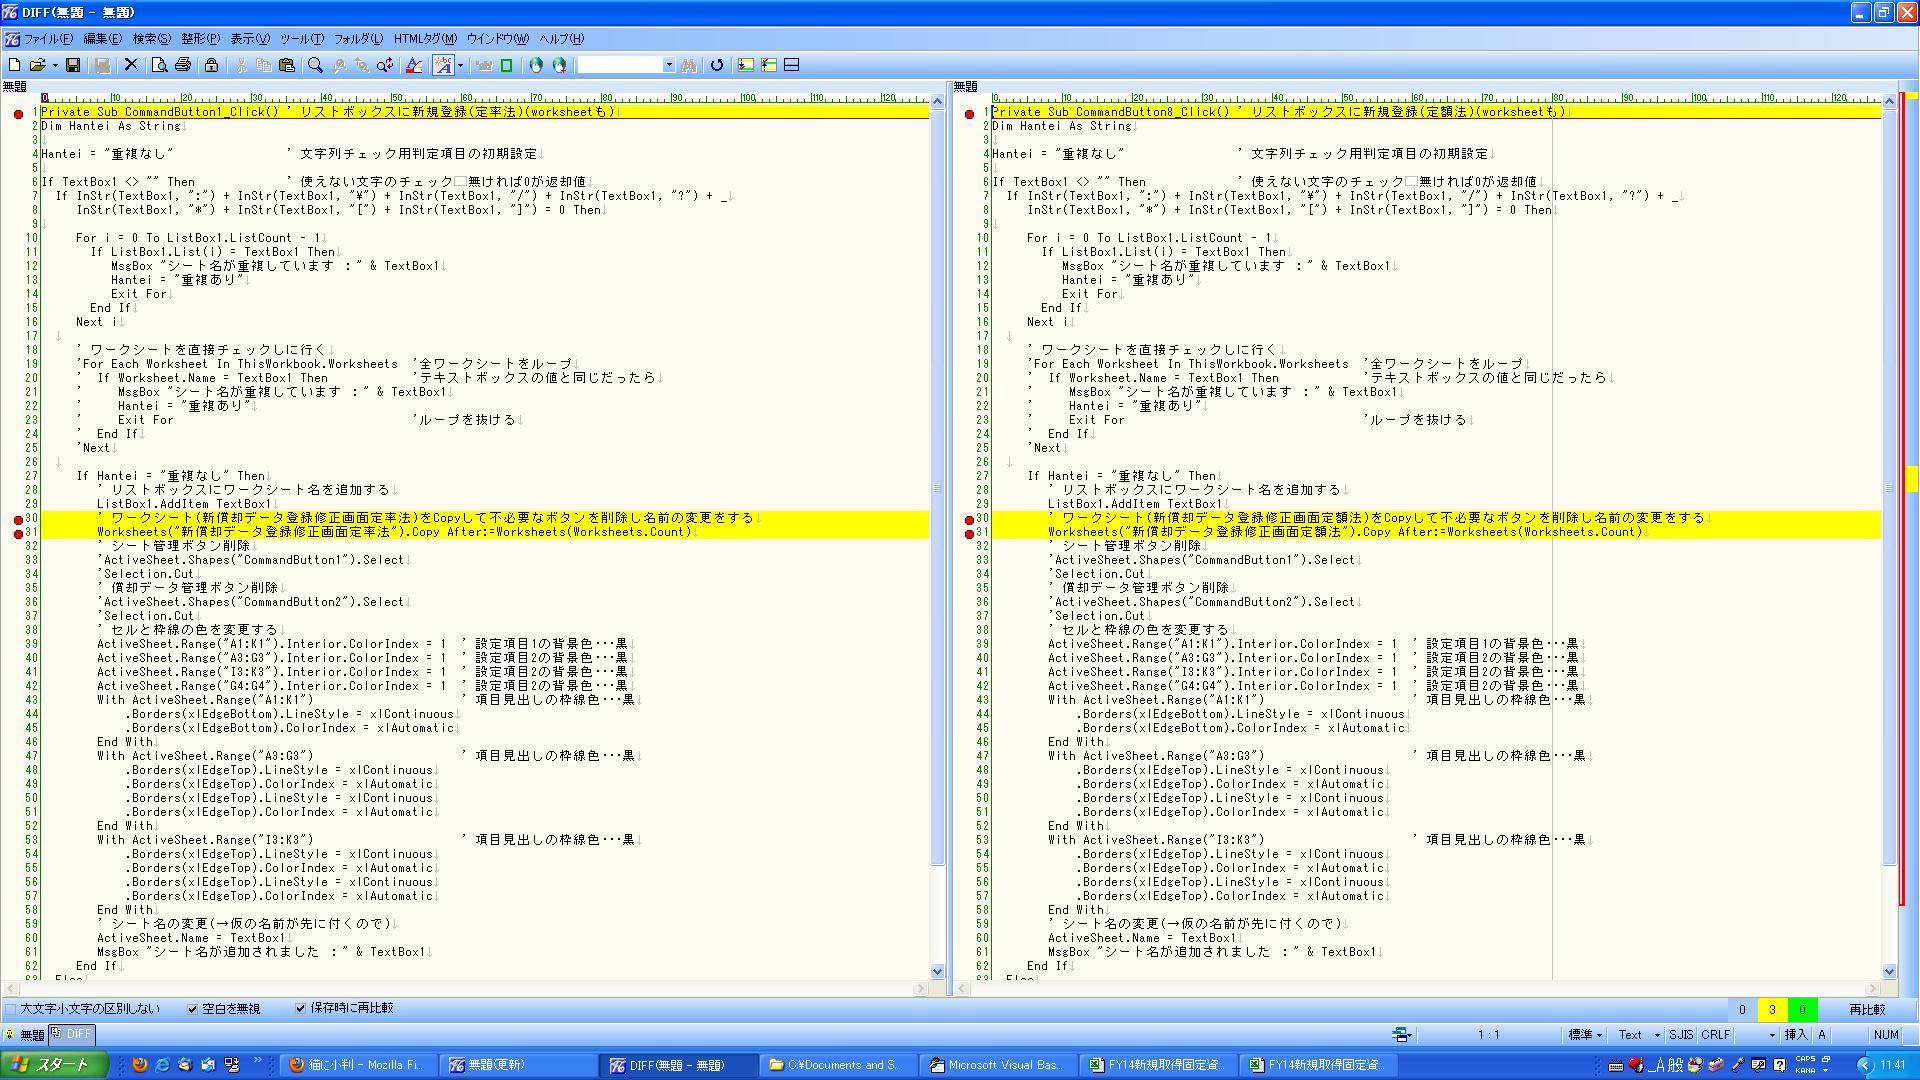 Excel 6 Vba